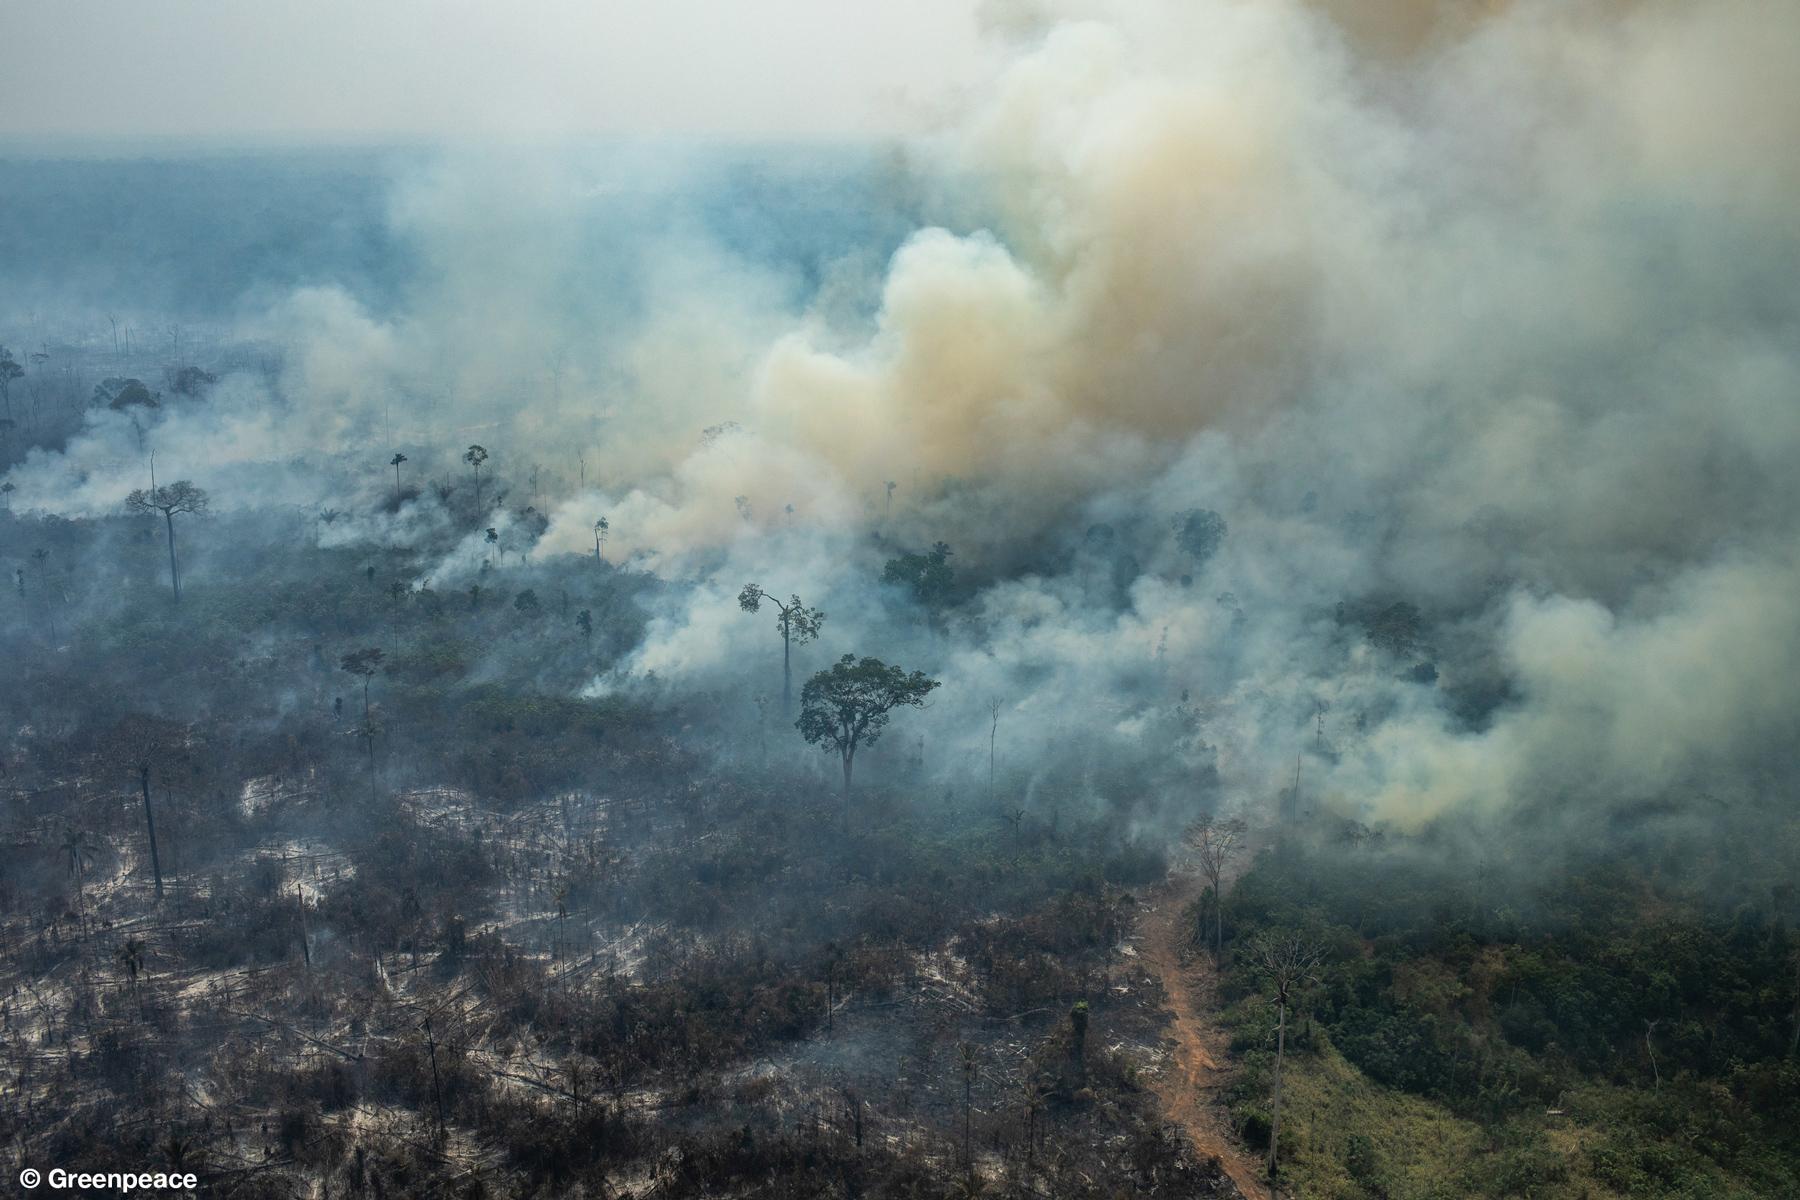 COLNIZA, MATO GROSSO, BRAZIL. Aerial view of burned areas in the Amazon rainforest, in the city of Colniza, Mato Grosso state. (Photo: Victor Moriyama / Greenpeace)